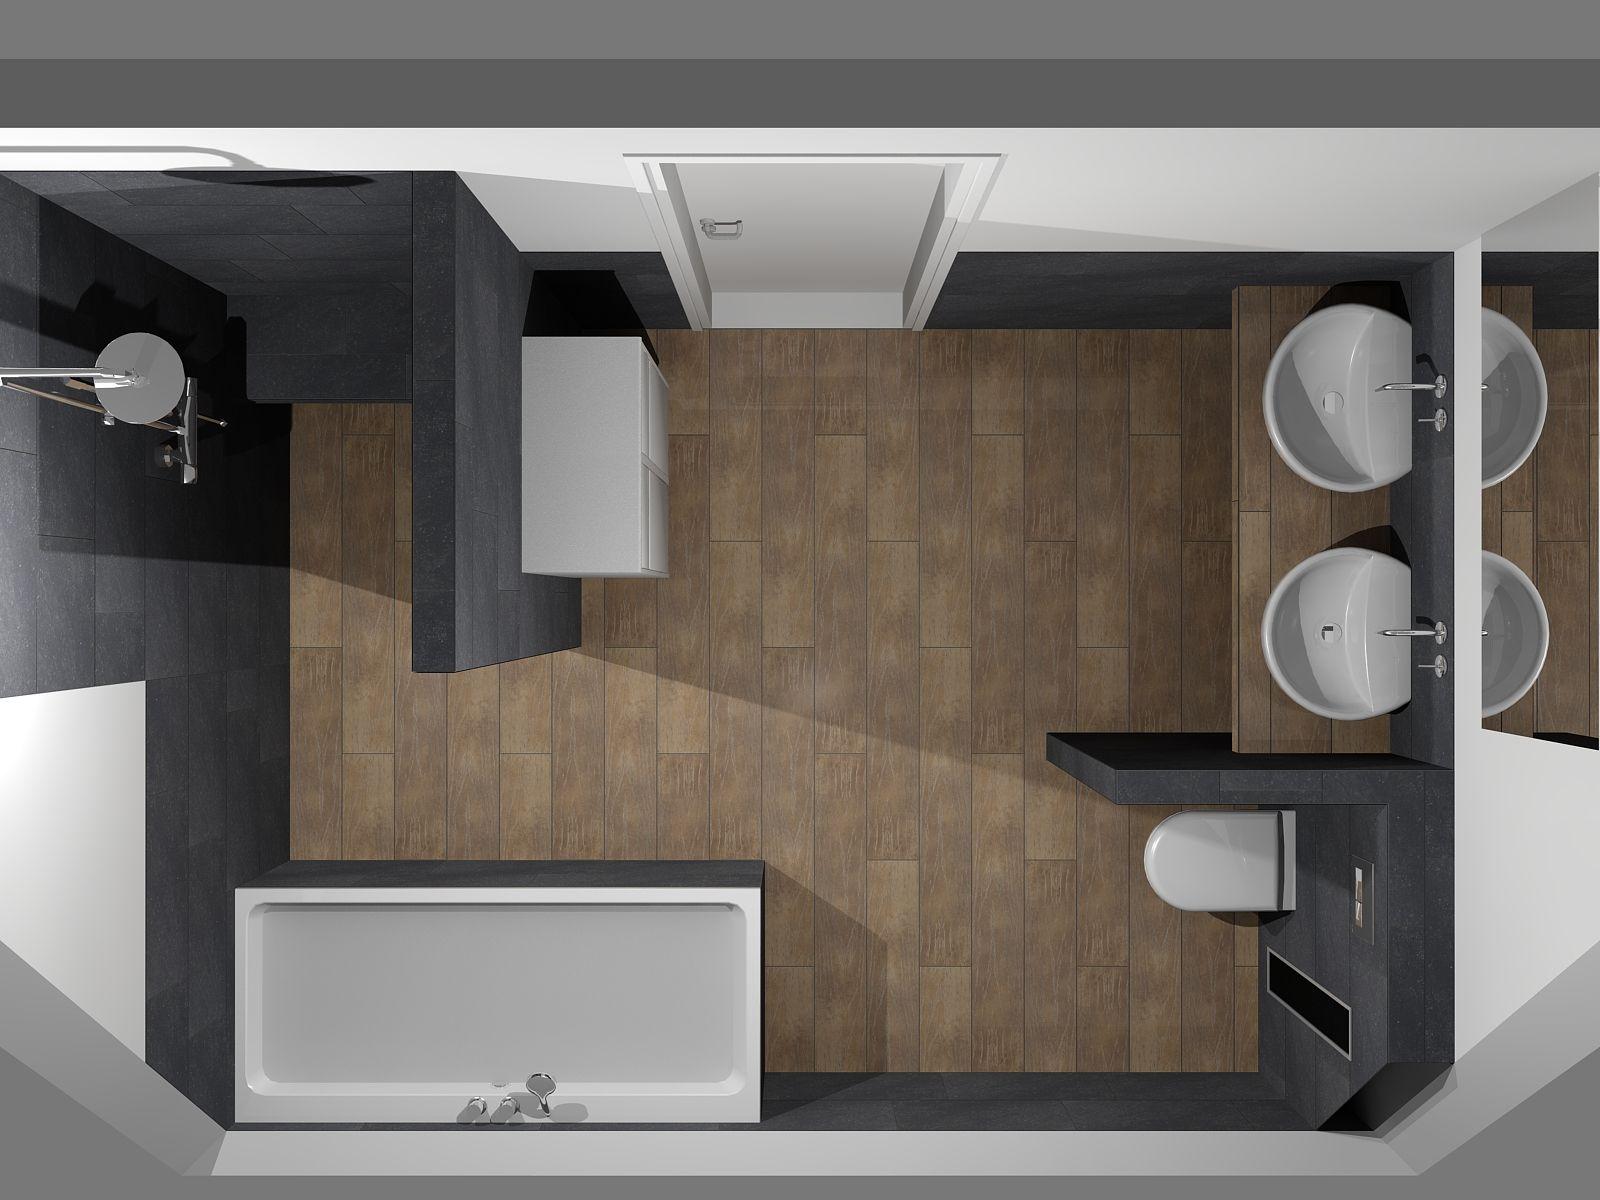 De eerste kamer moderne badkamer met ronde en rechthoekige vormen deze moderne badkamer is - Lay outs badkamer ...